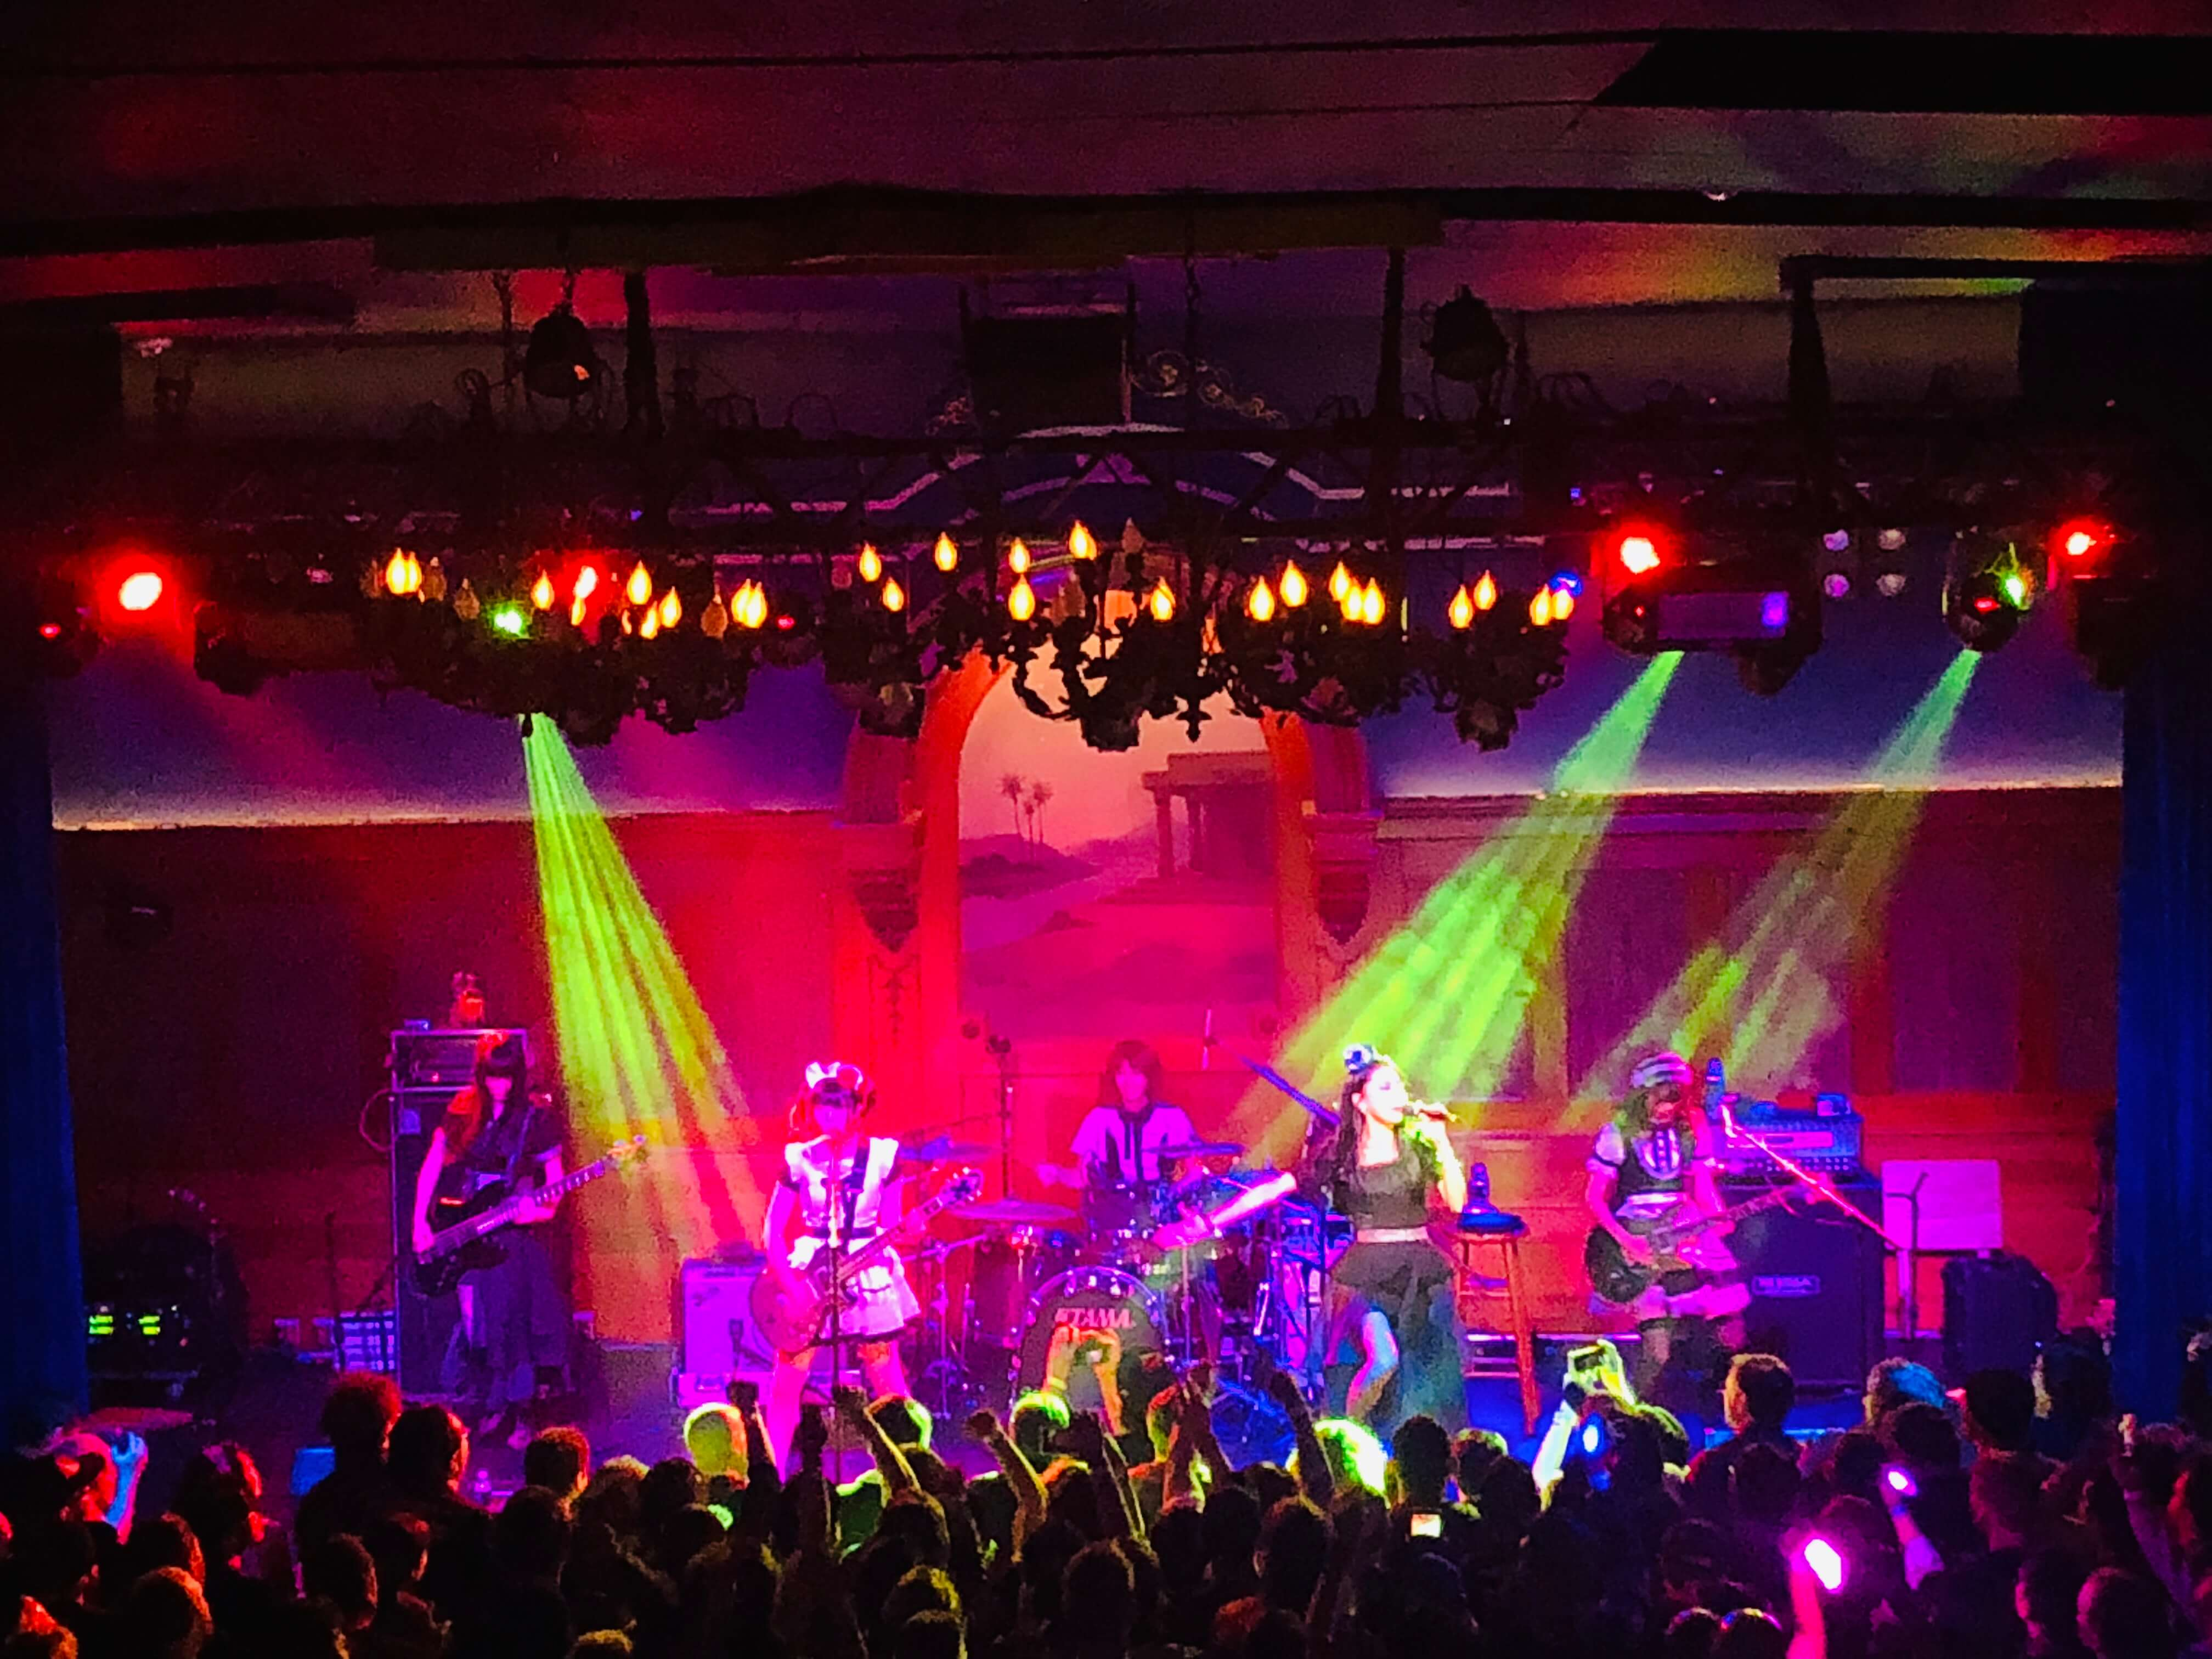 BAND-MAID、首次的美國one-man live大狂熱!也發表了新單曲 BAND-MAID_、